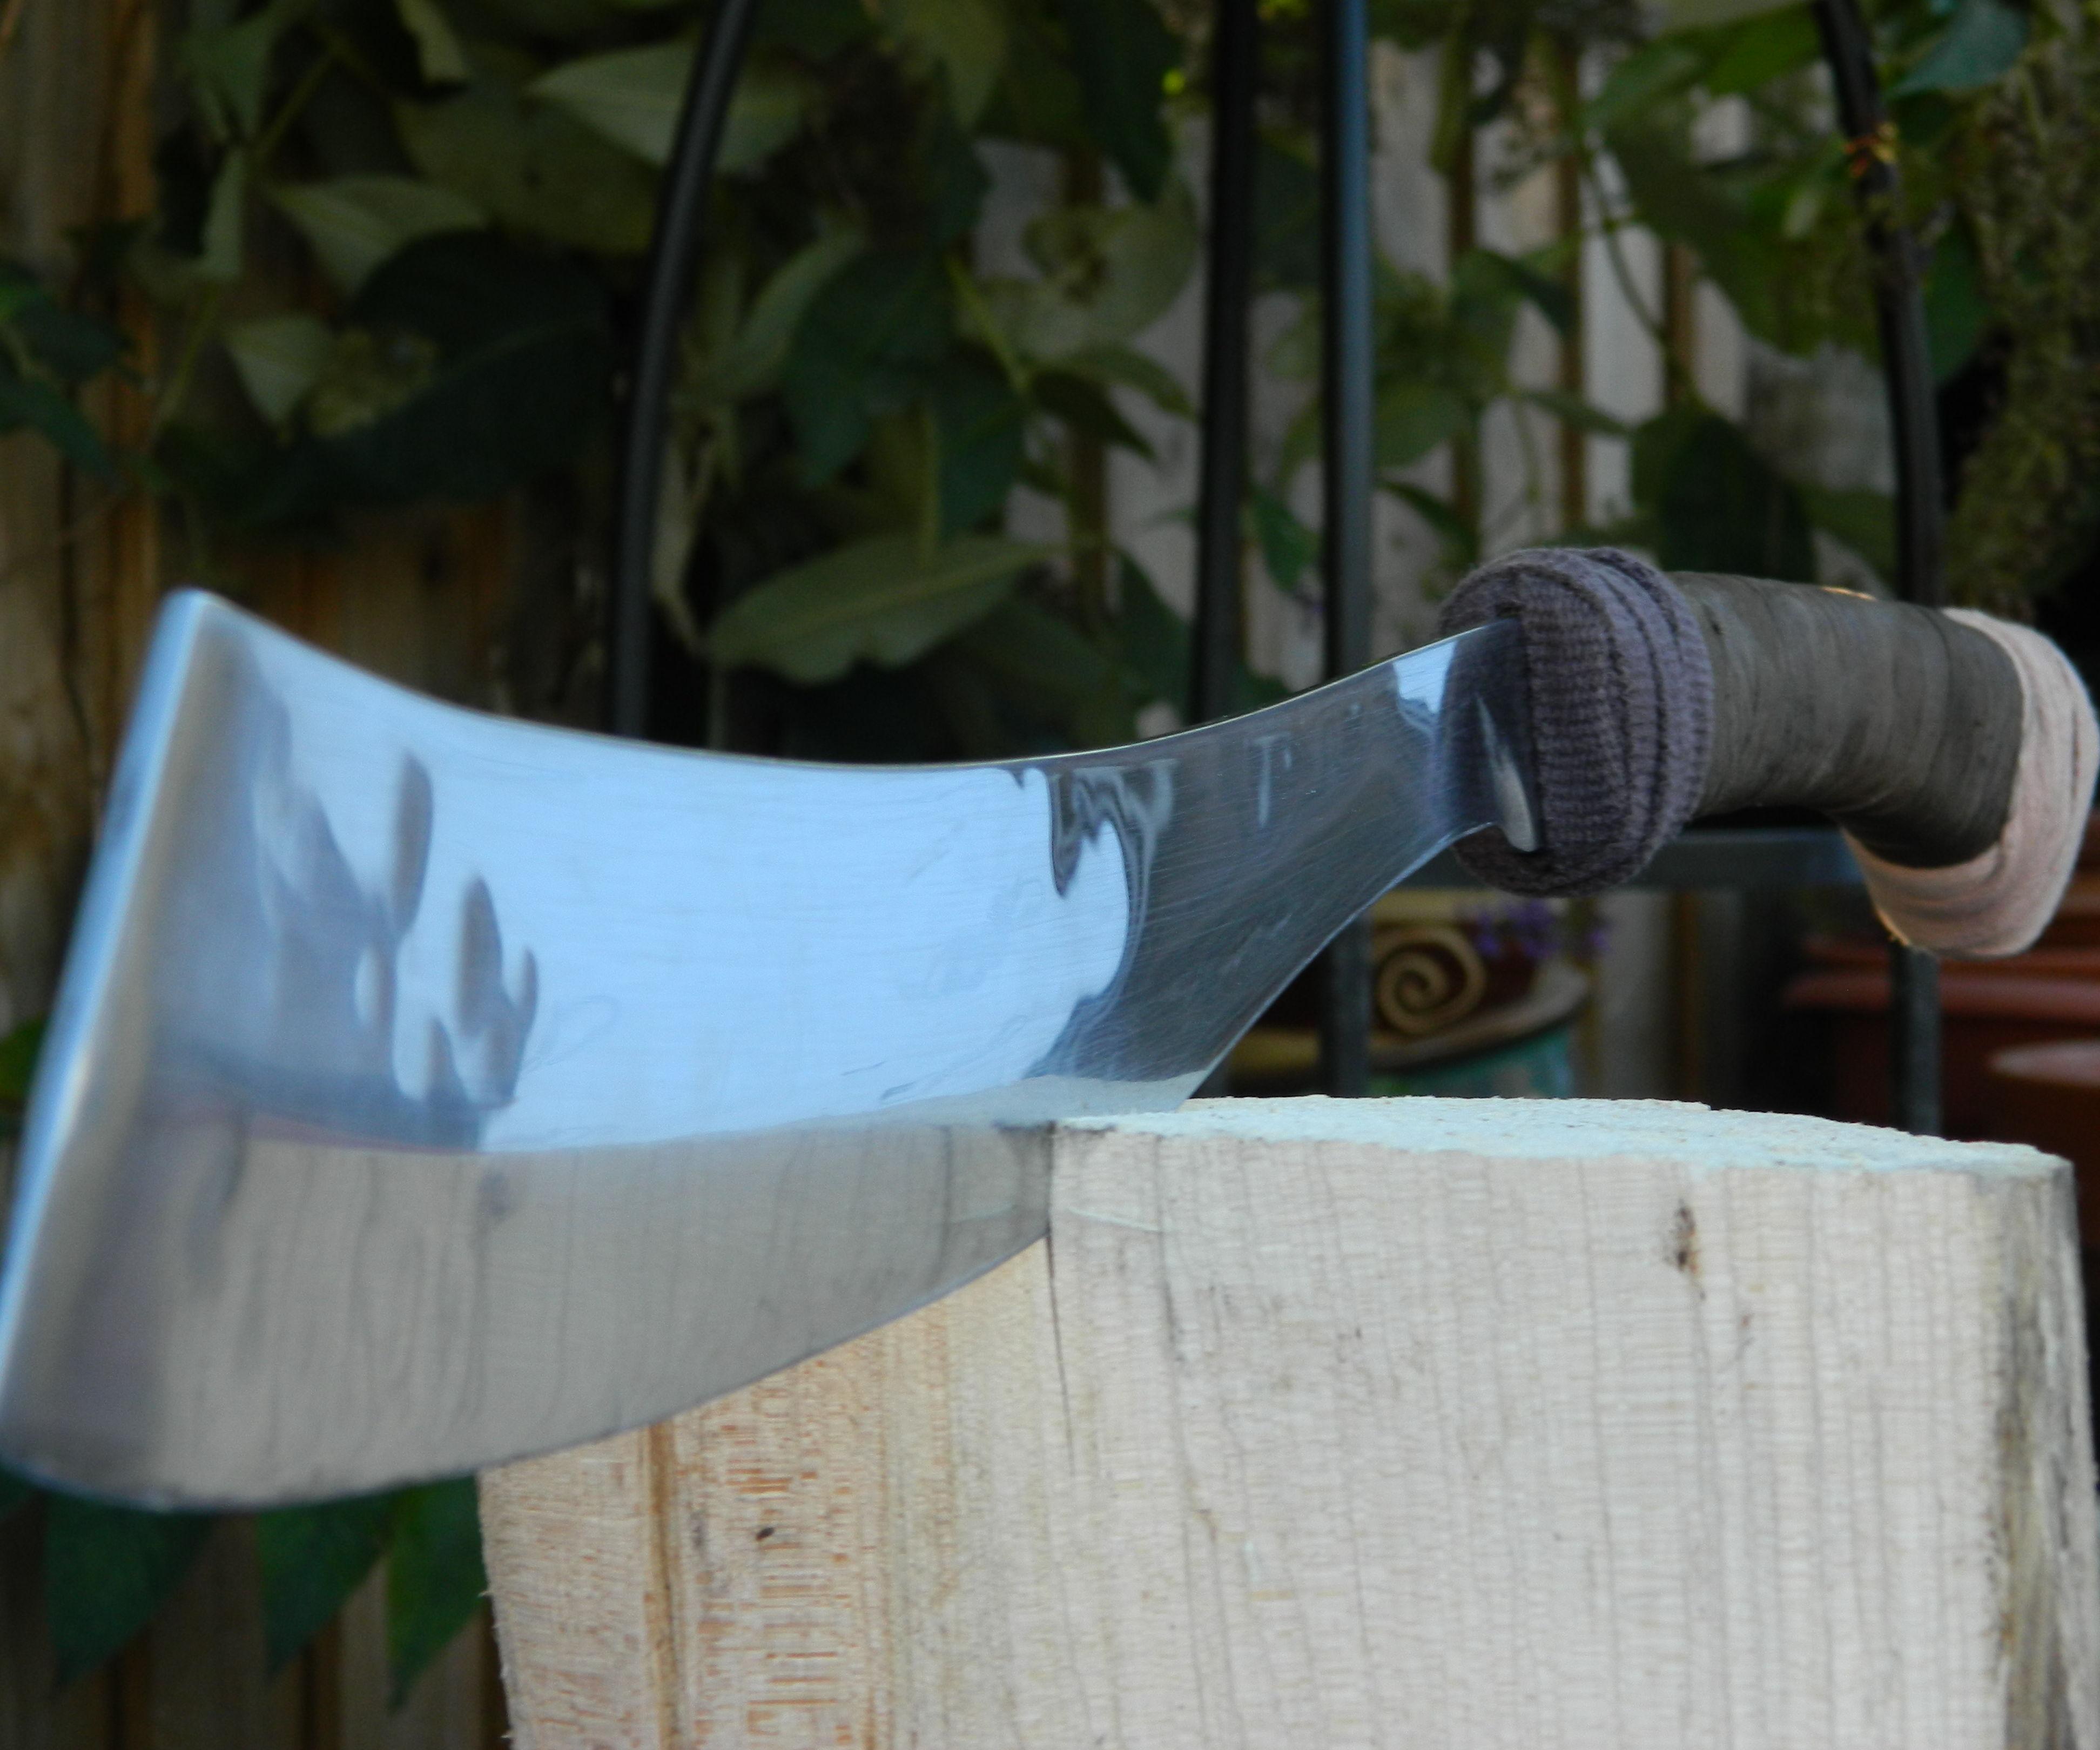 Decorative Sword/Machete for the Novice Metalworker